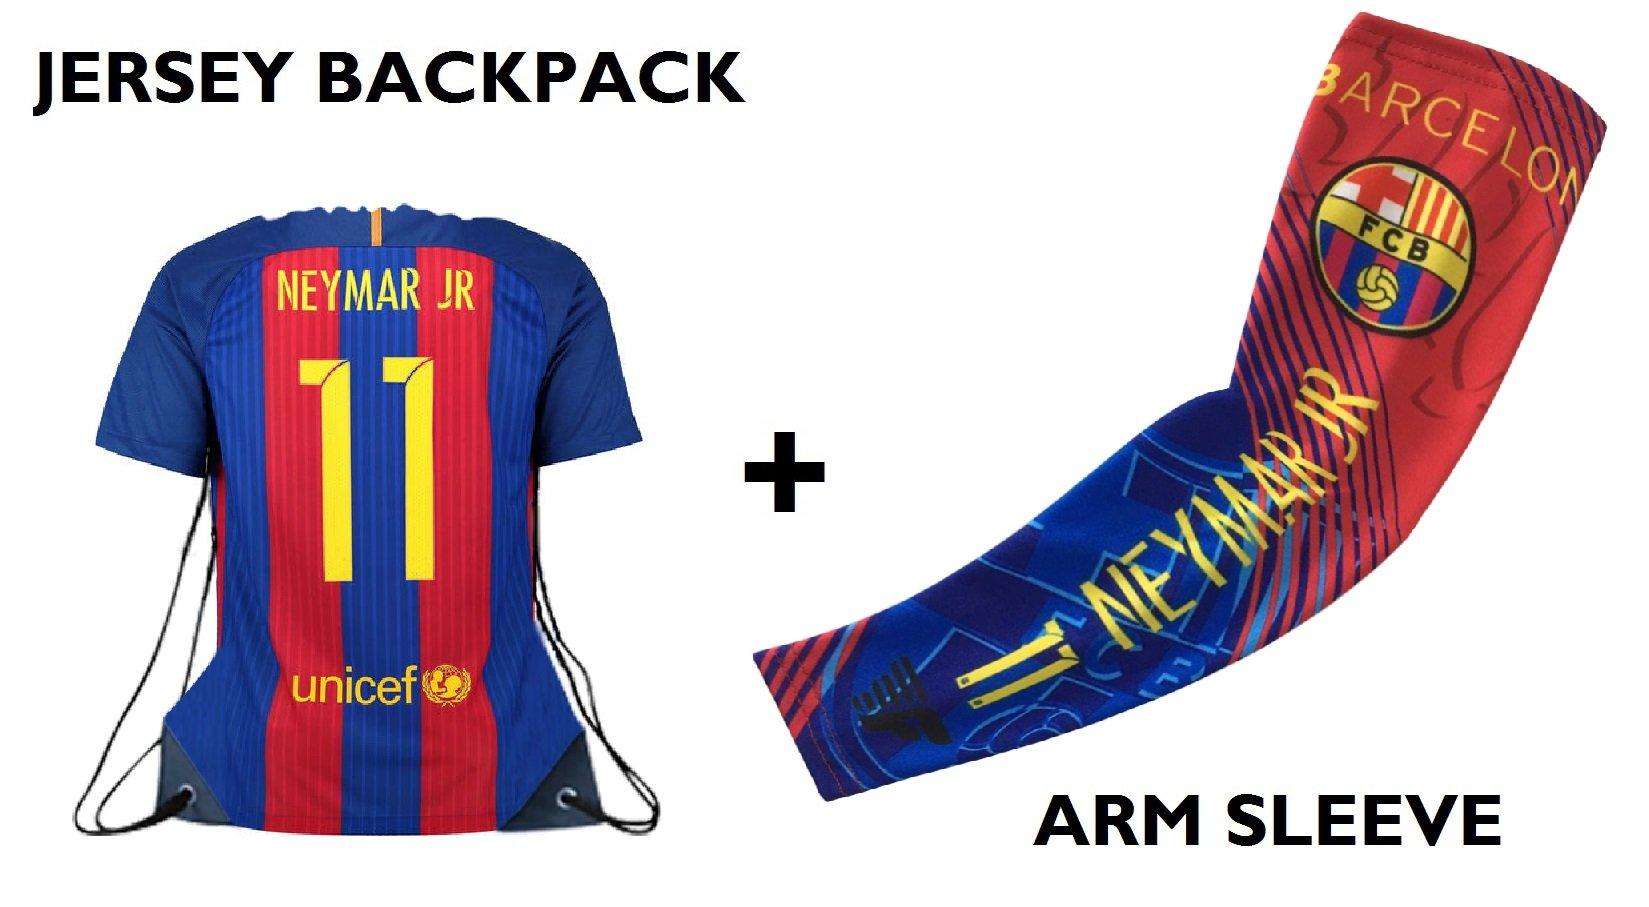 Forever Fanatics Barcelona Neymar #11 Soccer Fan ift Set ✓ Nemar Jr #11 Jersey Drawstring Backpack Gym Bag & Matchin Compression Arm Sleeve (Youth Size (6-13 yrs), Neymar Jr #11 Gift Set)